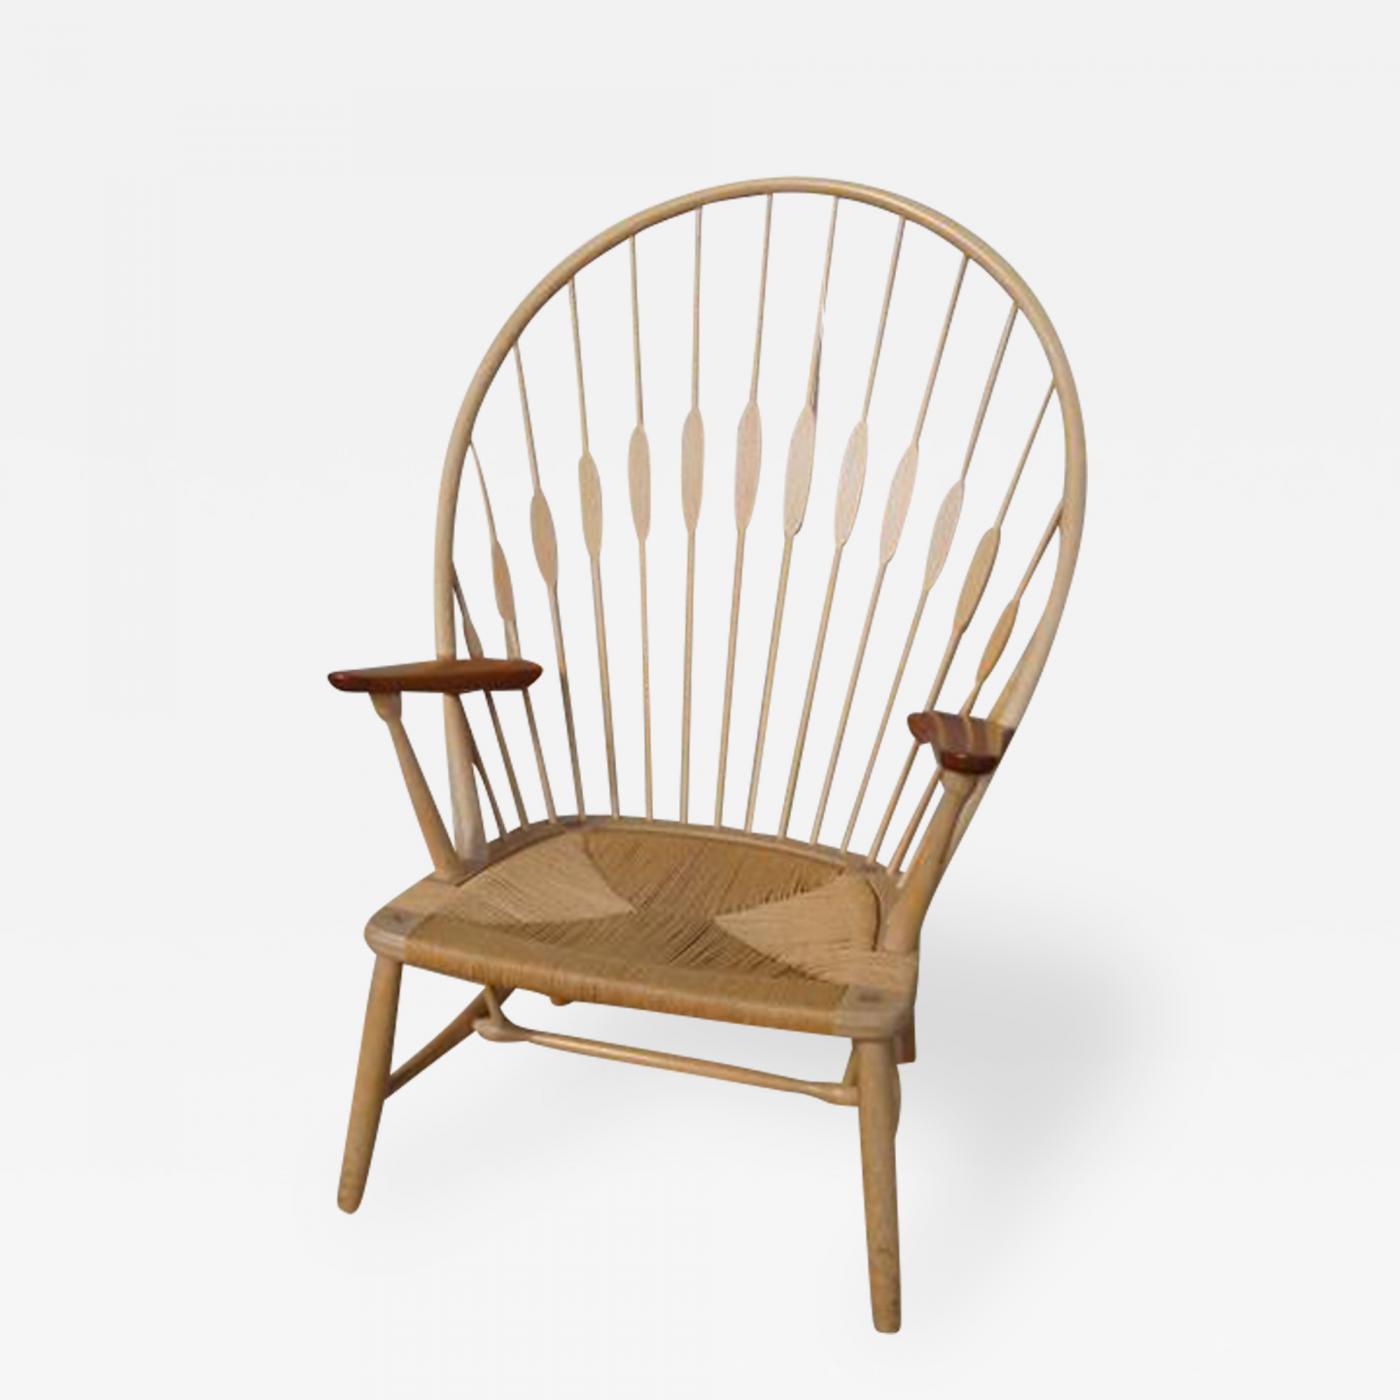 hans wegner peacock chair. Peacock Chair By Hans Wegner For Johannes Hansen. More Images Want Images? I